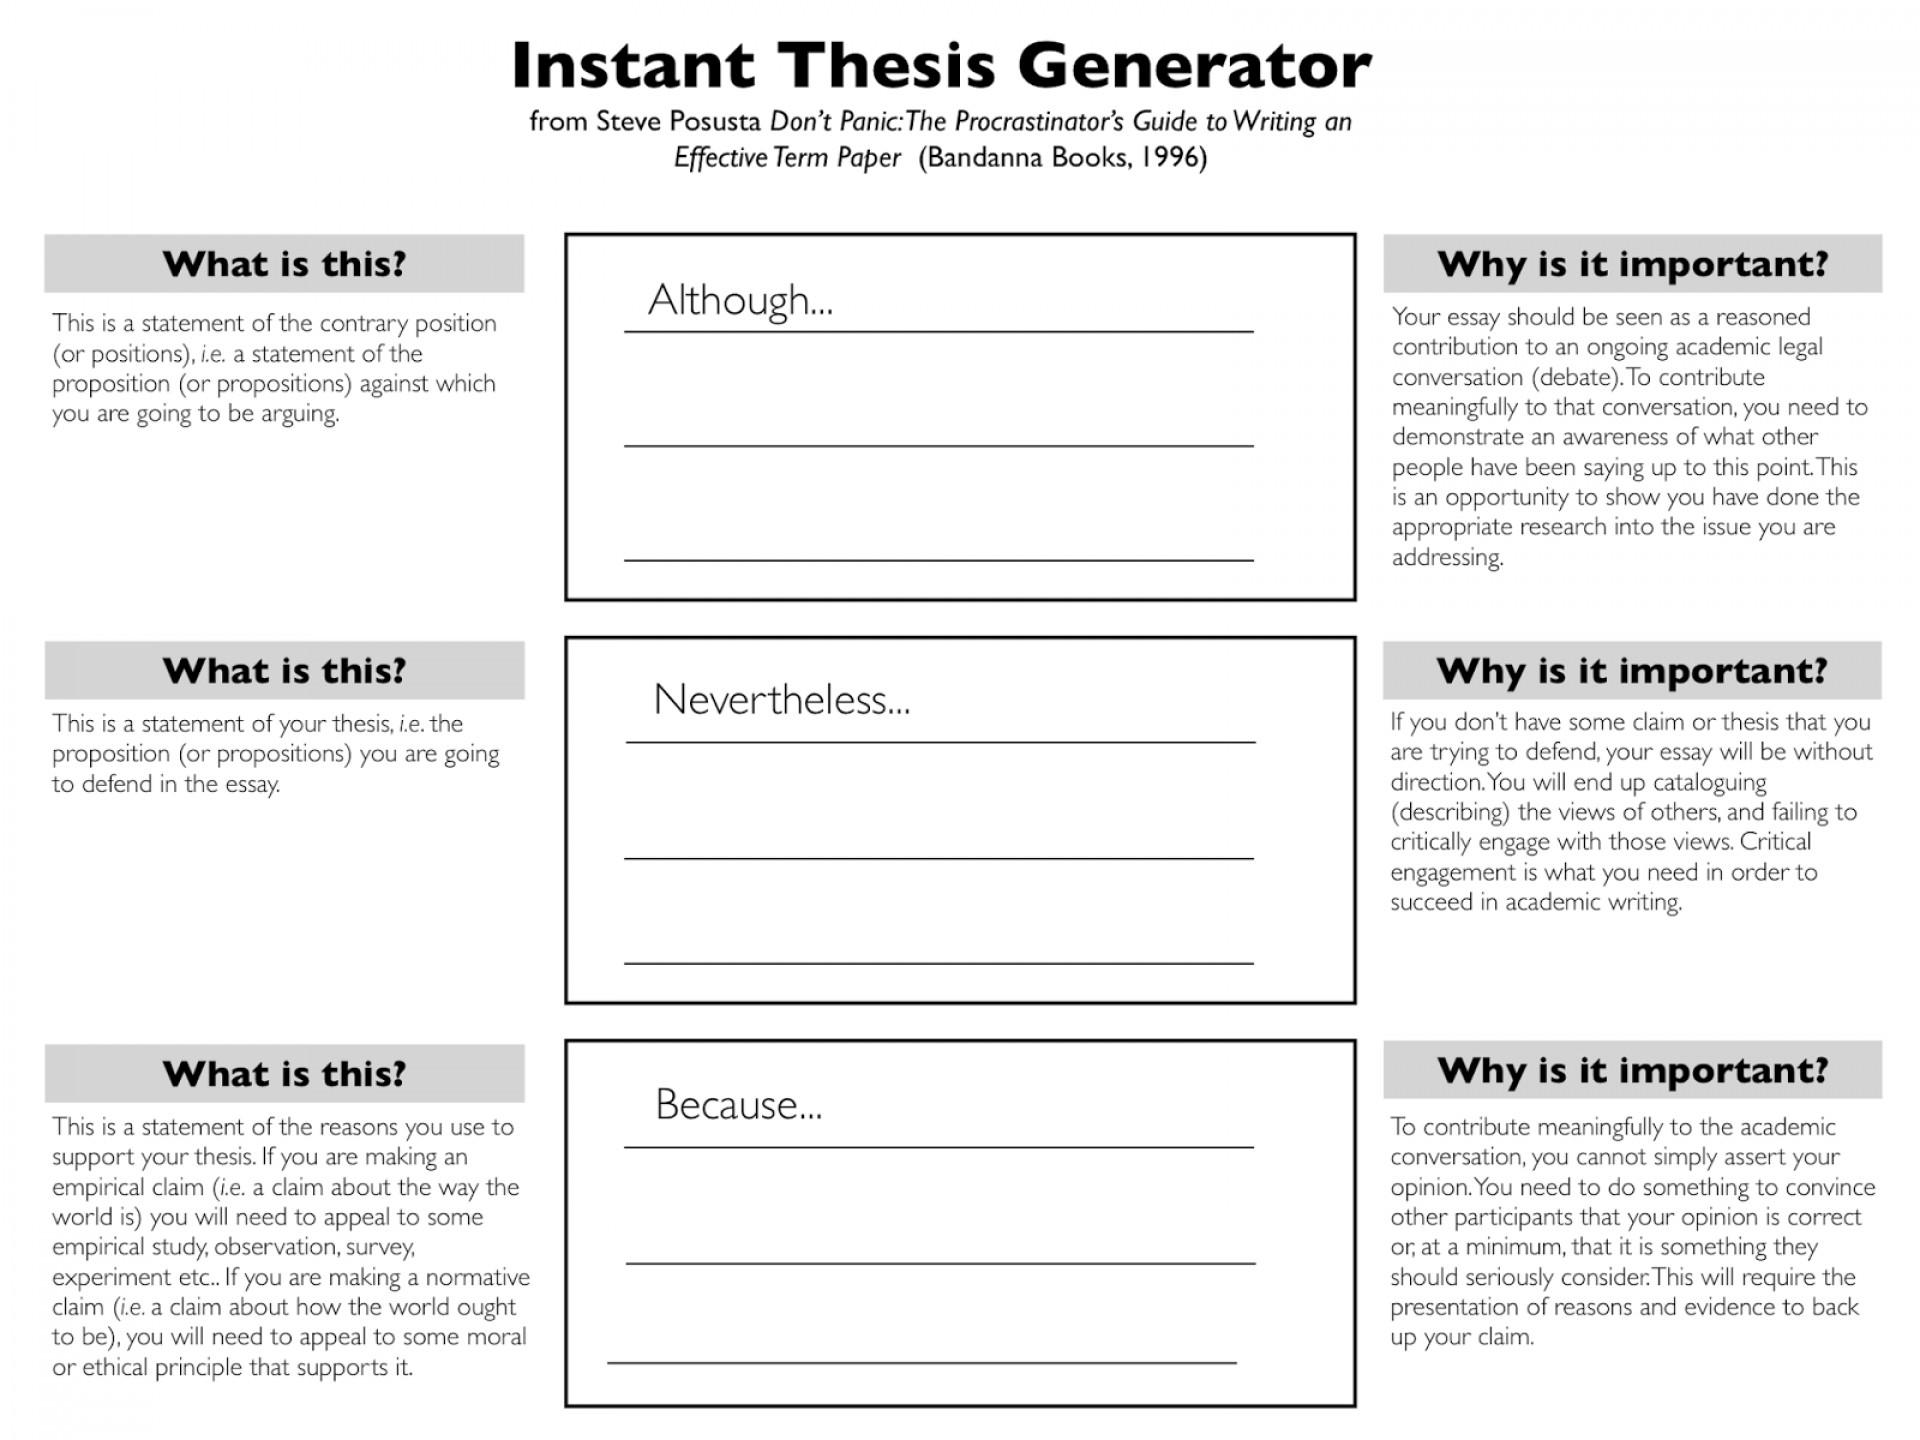 020 Instant2bthesis2bgenerator Essay Example Scholarship Singular Tips Rotc Psc Reddit 1920